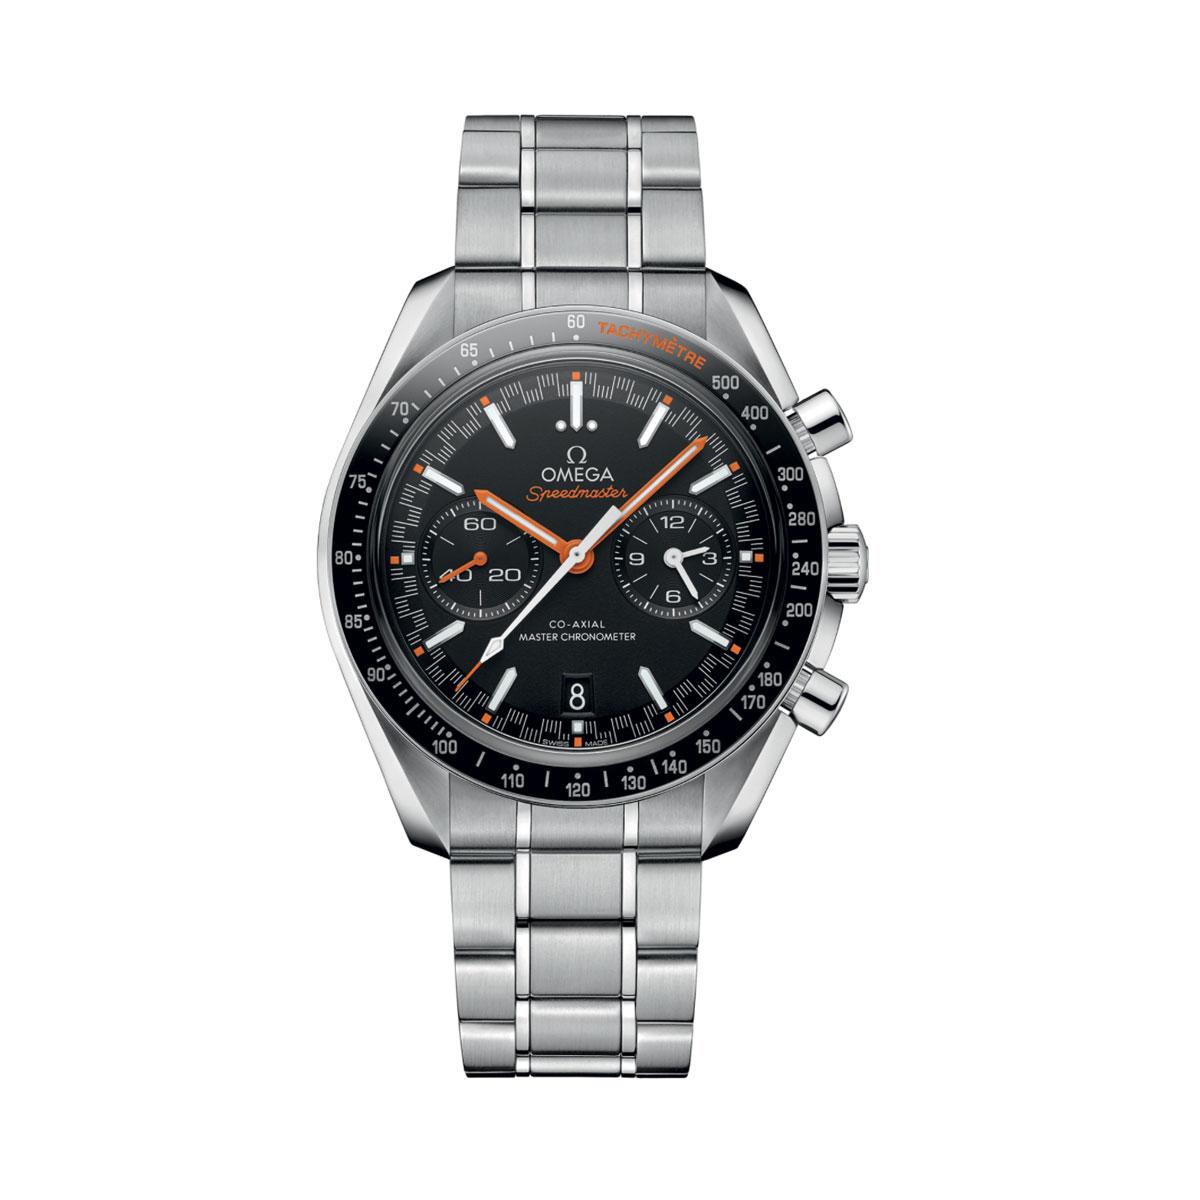 Omega 329.30.44.51.01.002, black dial with orange detail on stainless steel bracelet